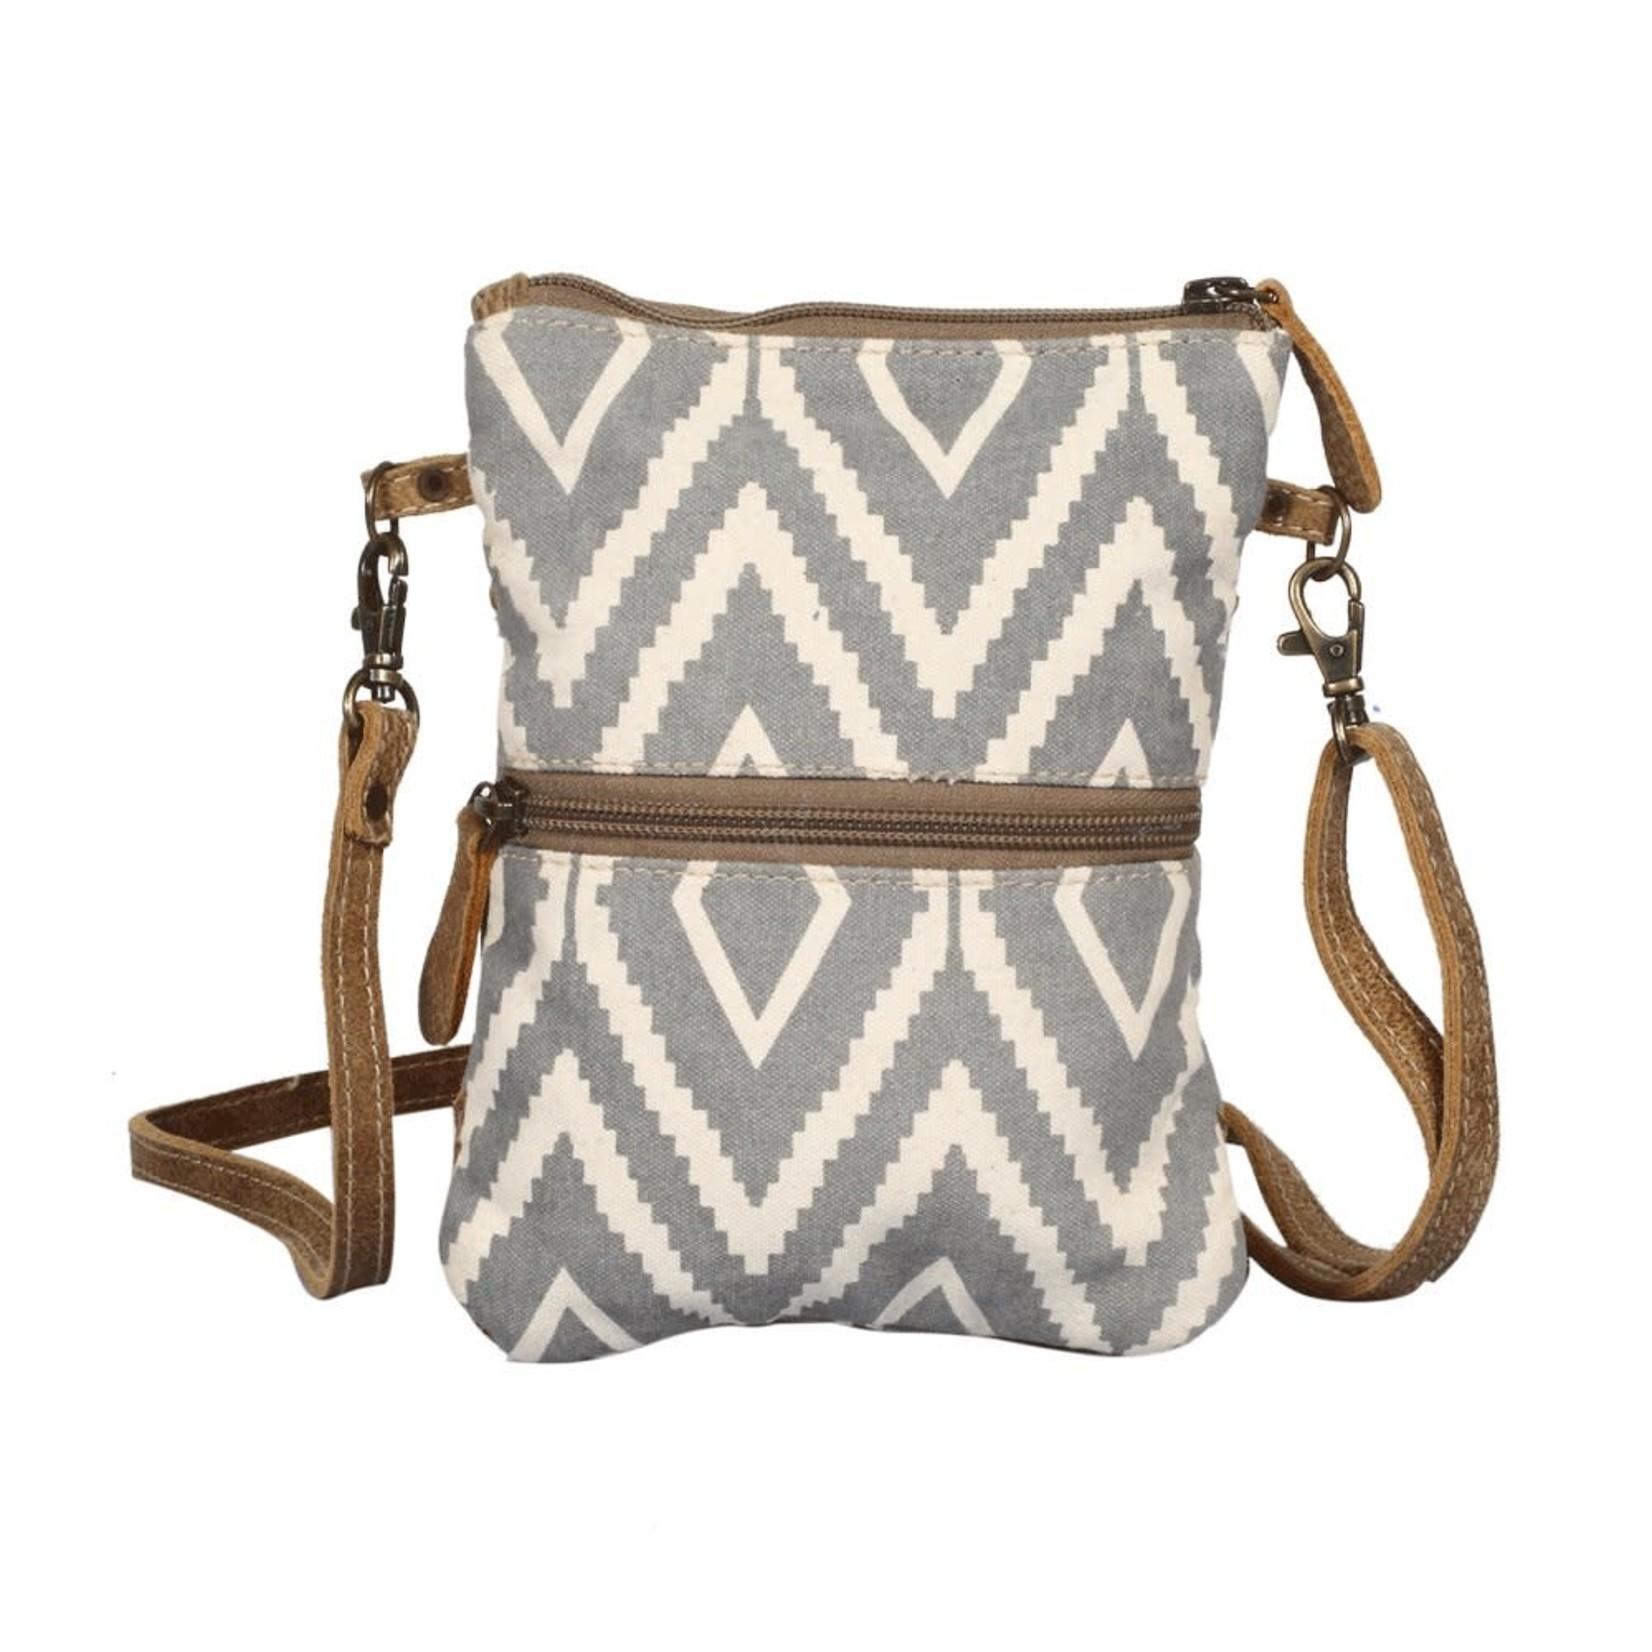 Myra Bags S-1357 Gladden Small & Crossbody Bag